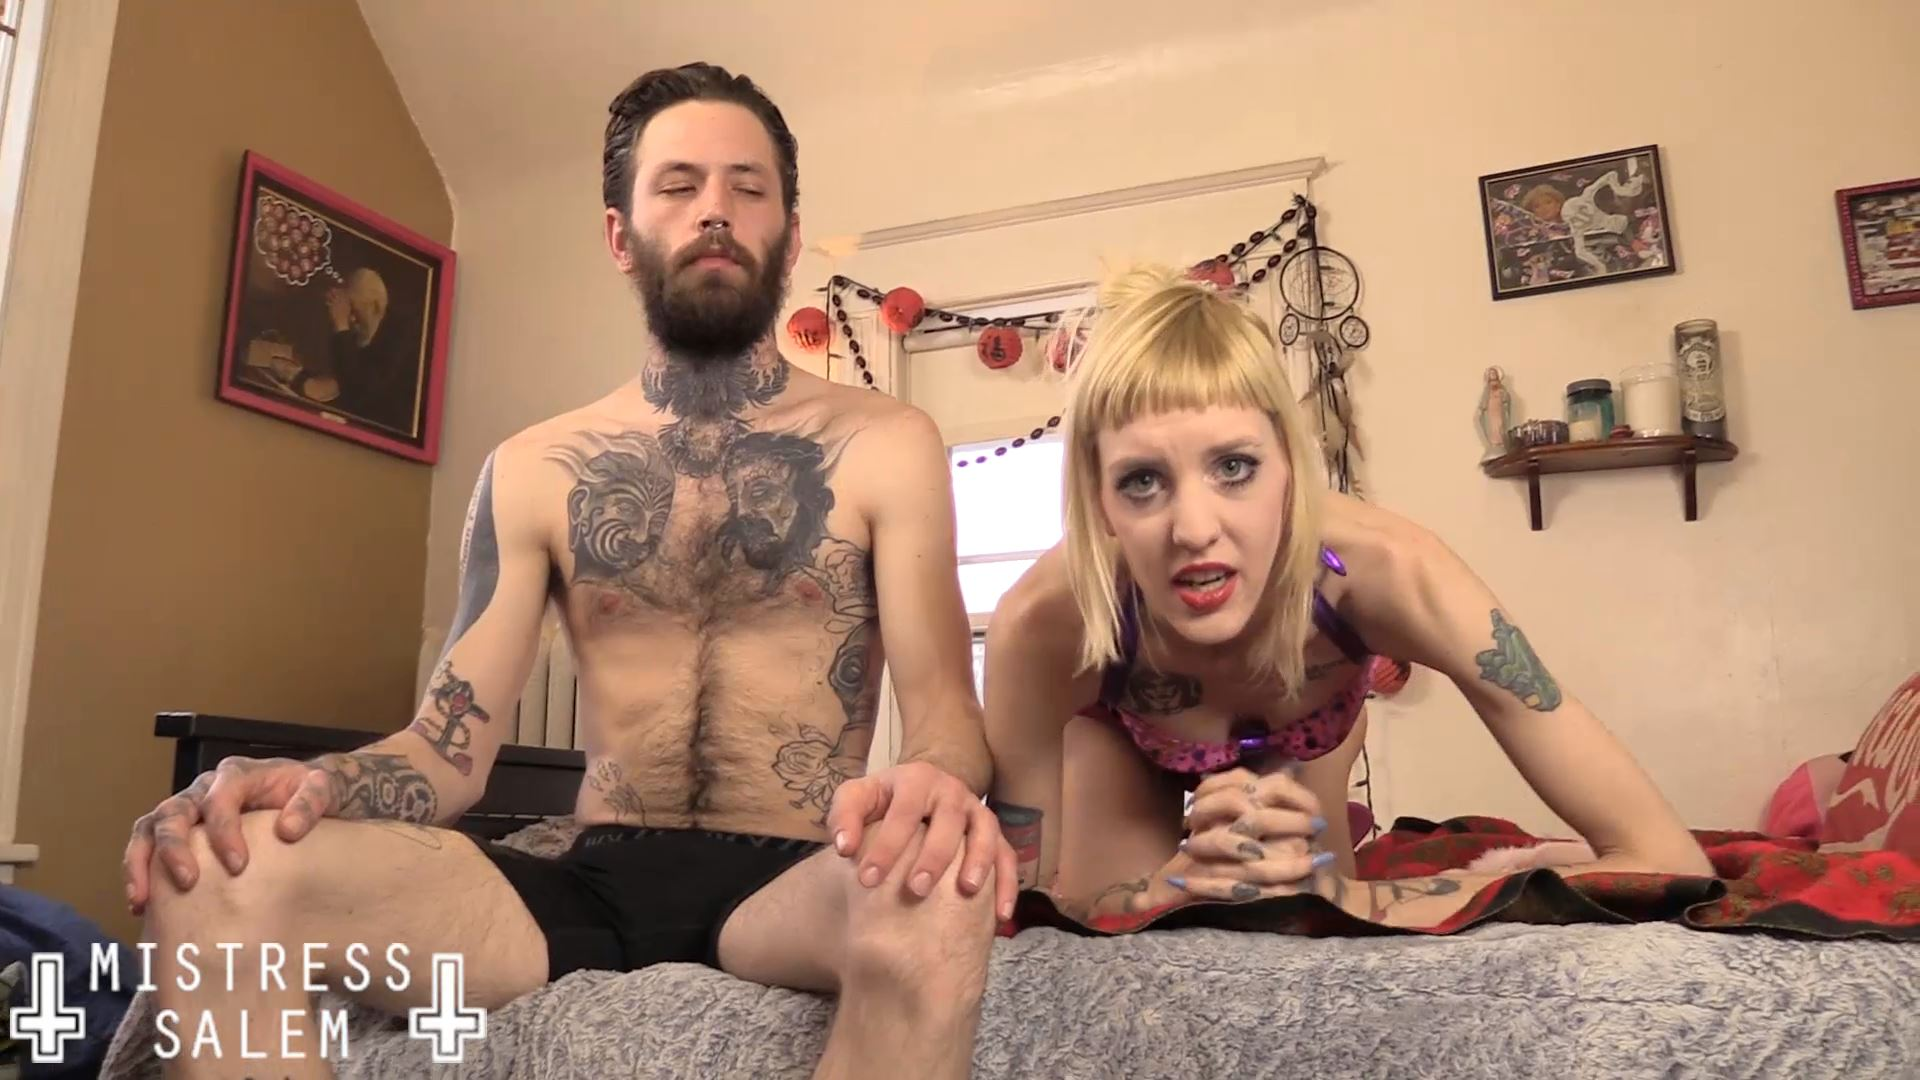 Mistress Salem In Scene: Go Gay for Bae - MISTRESS SALEM - FULL HD/1080p/MP4